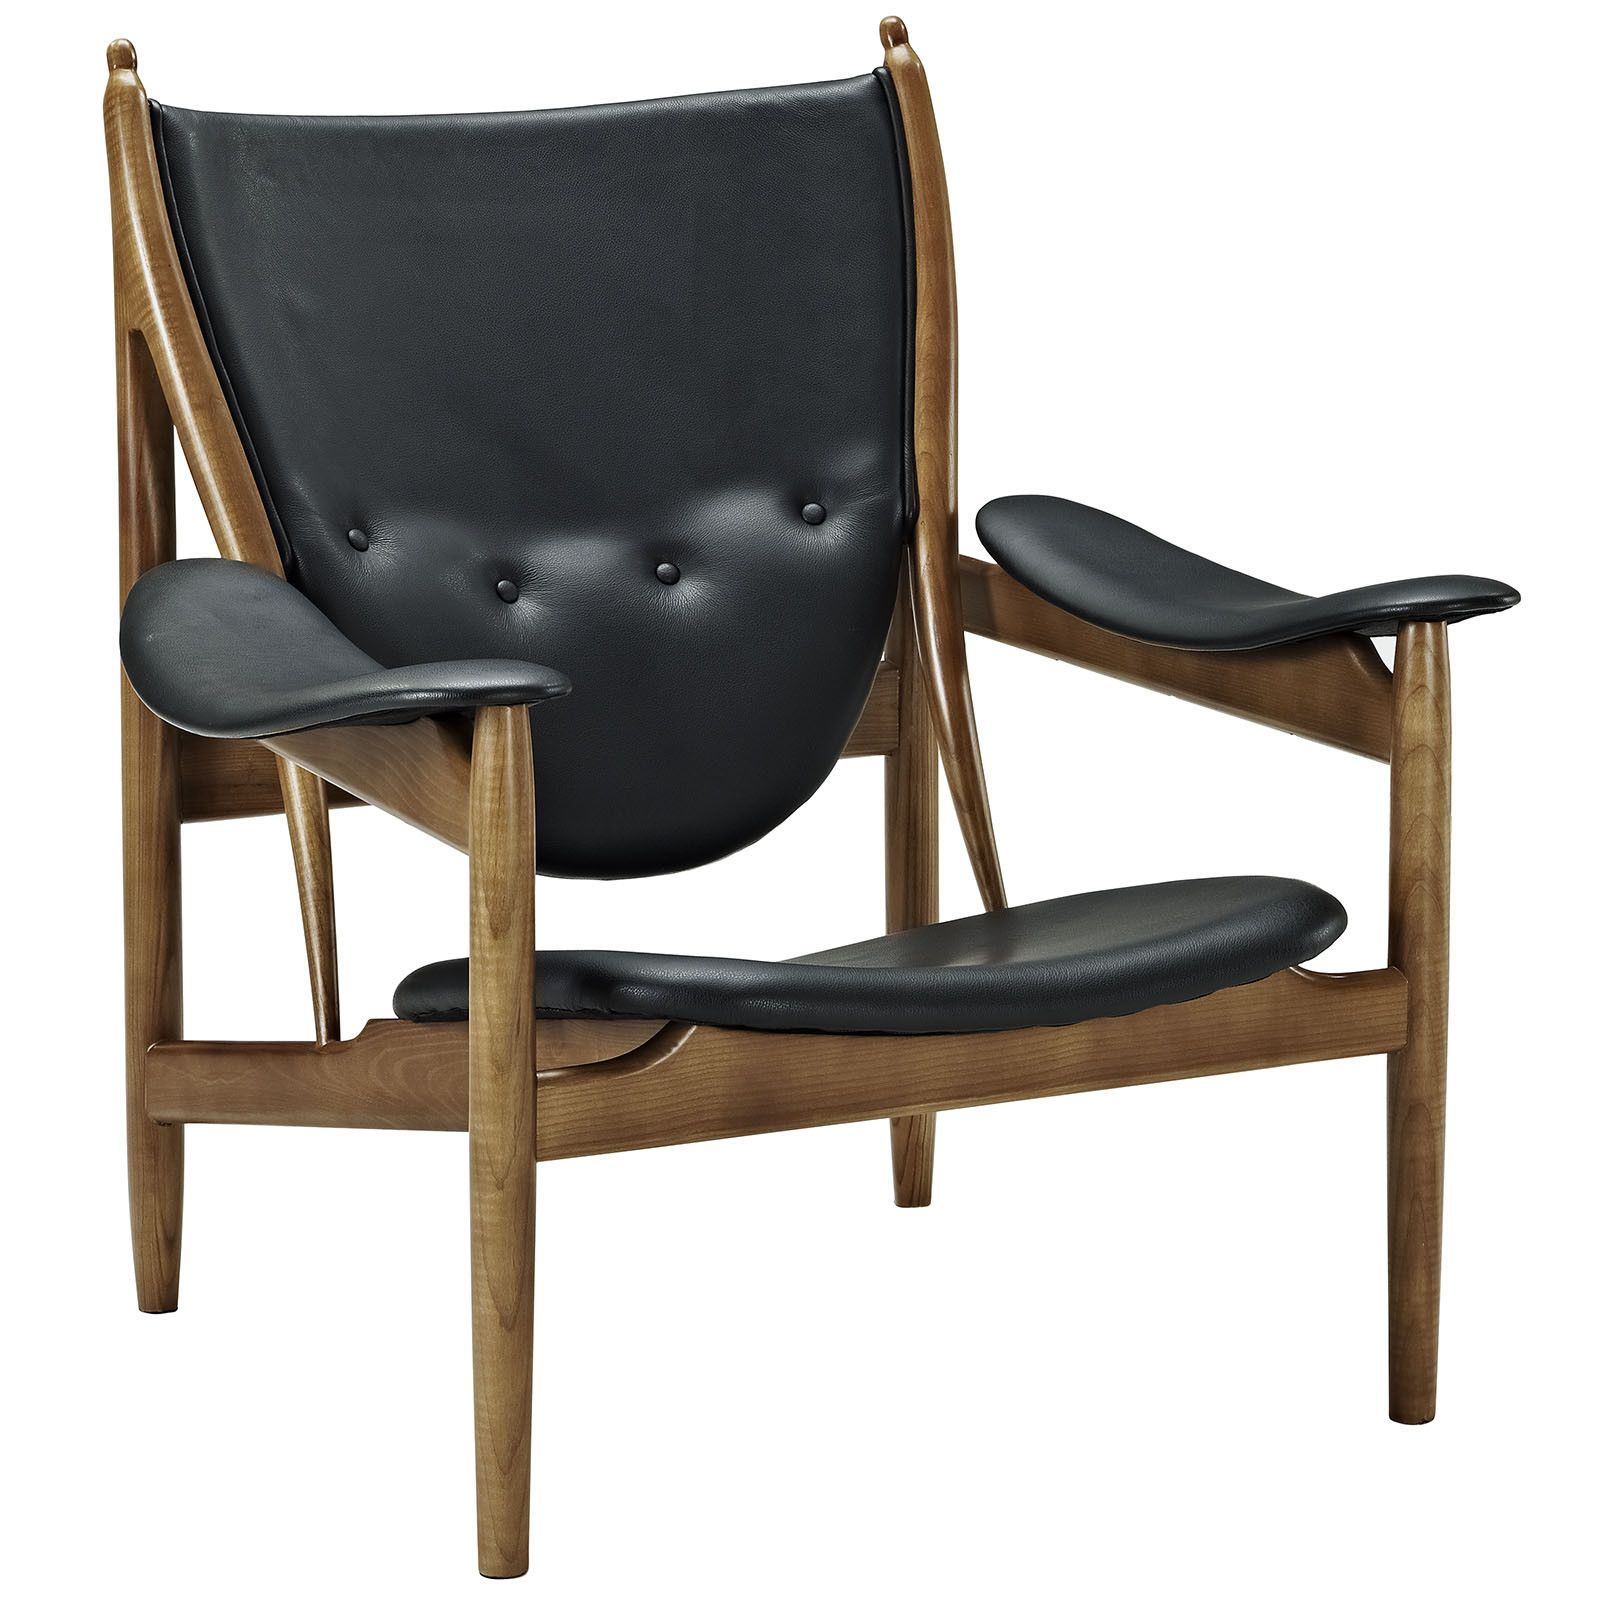 LexMod Finn Juhl Style Chieftains Chair Black Leather